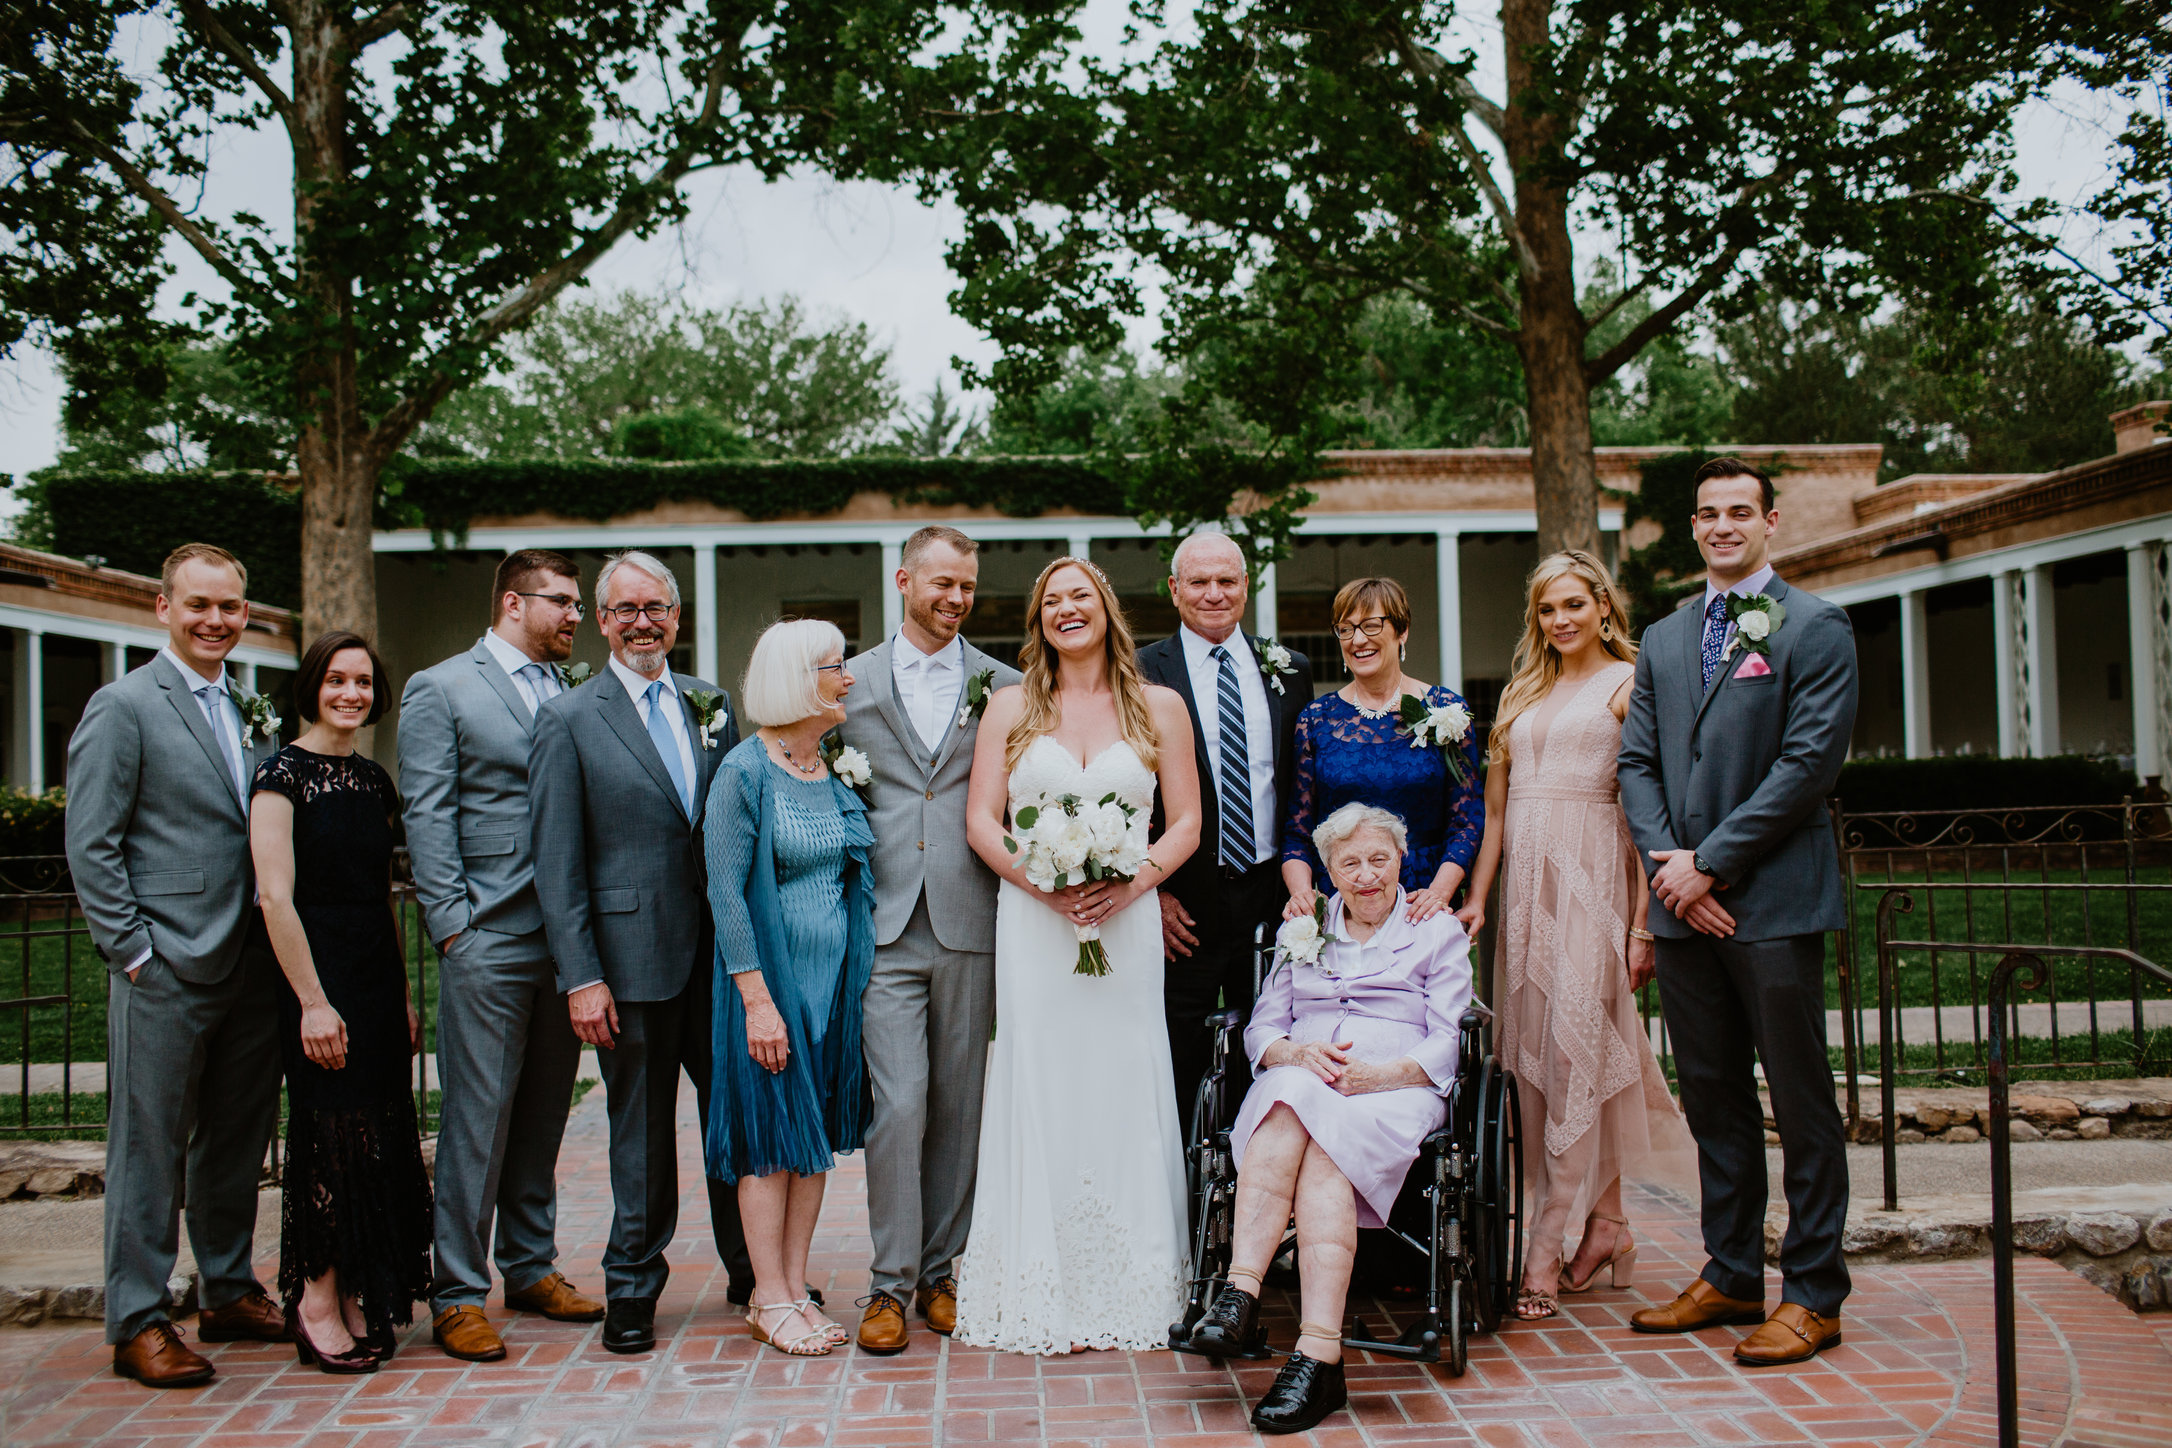 DandA-wedding-472.jpg